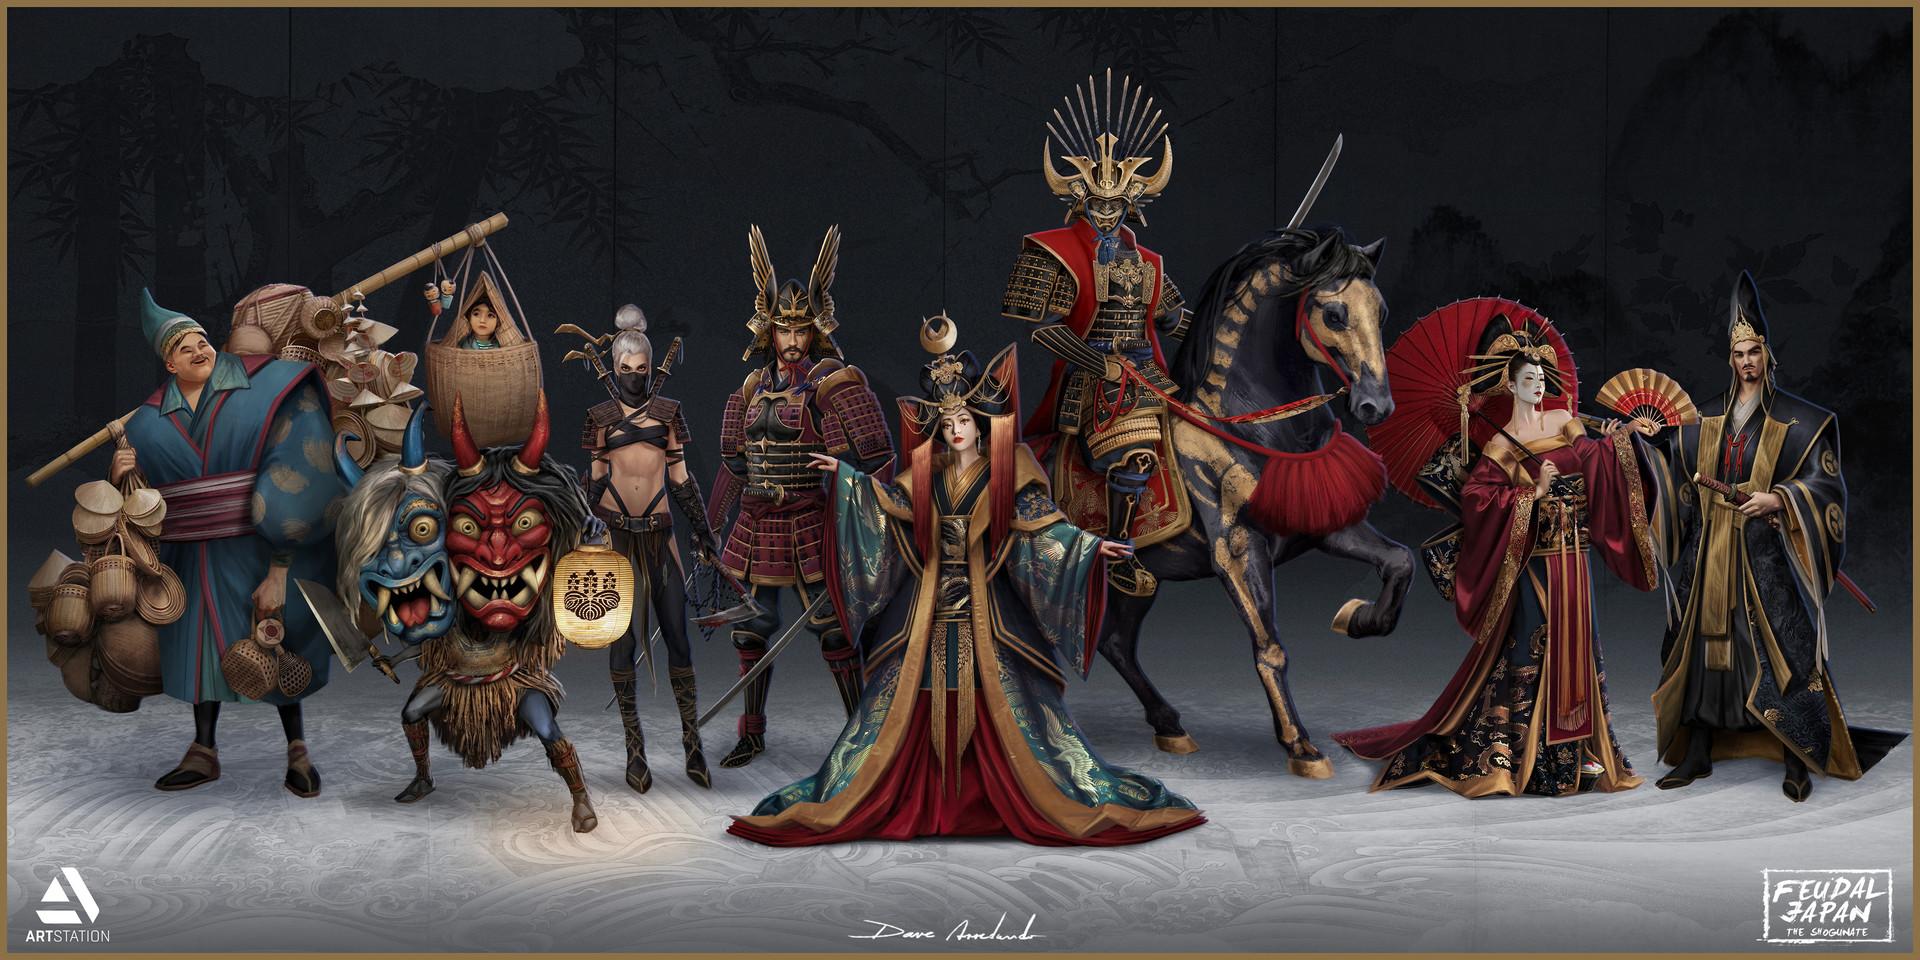 Dave arredondo feudaljapan theshogunate davearredondo2